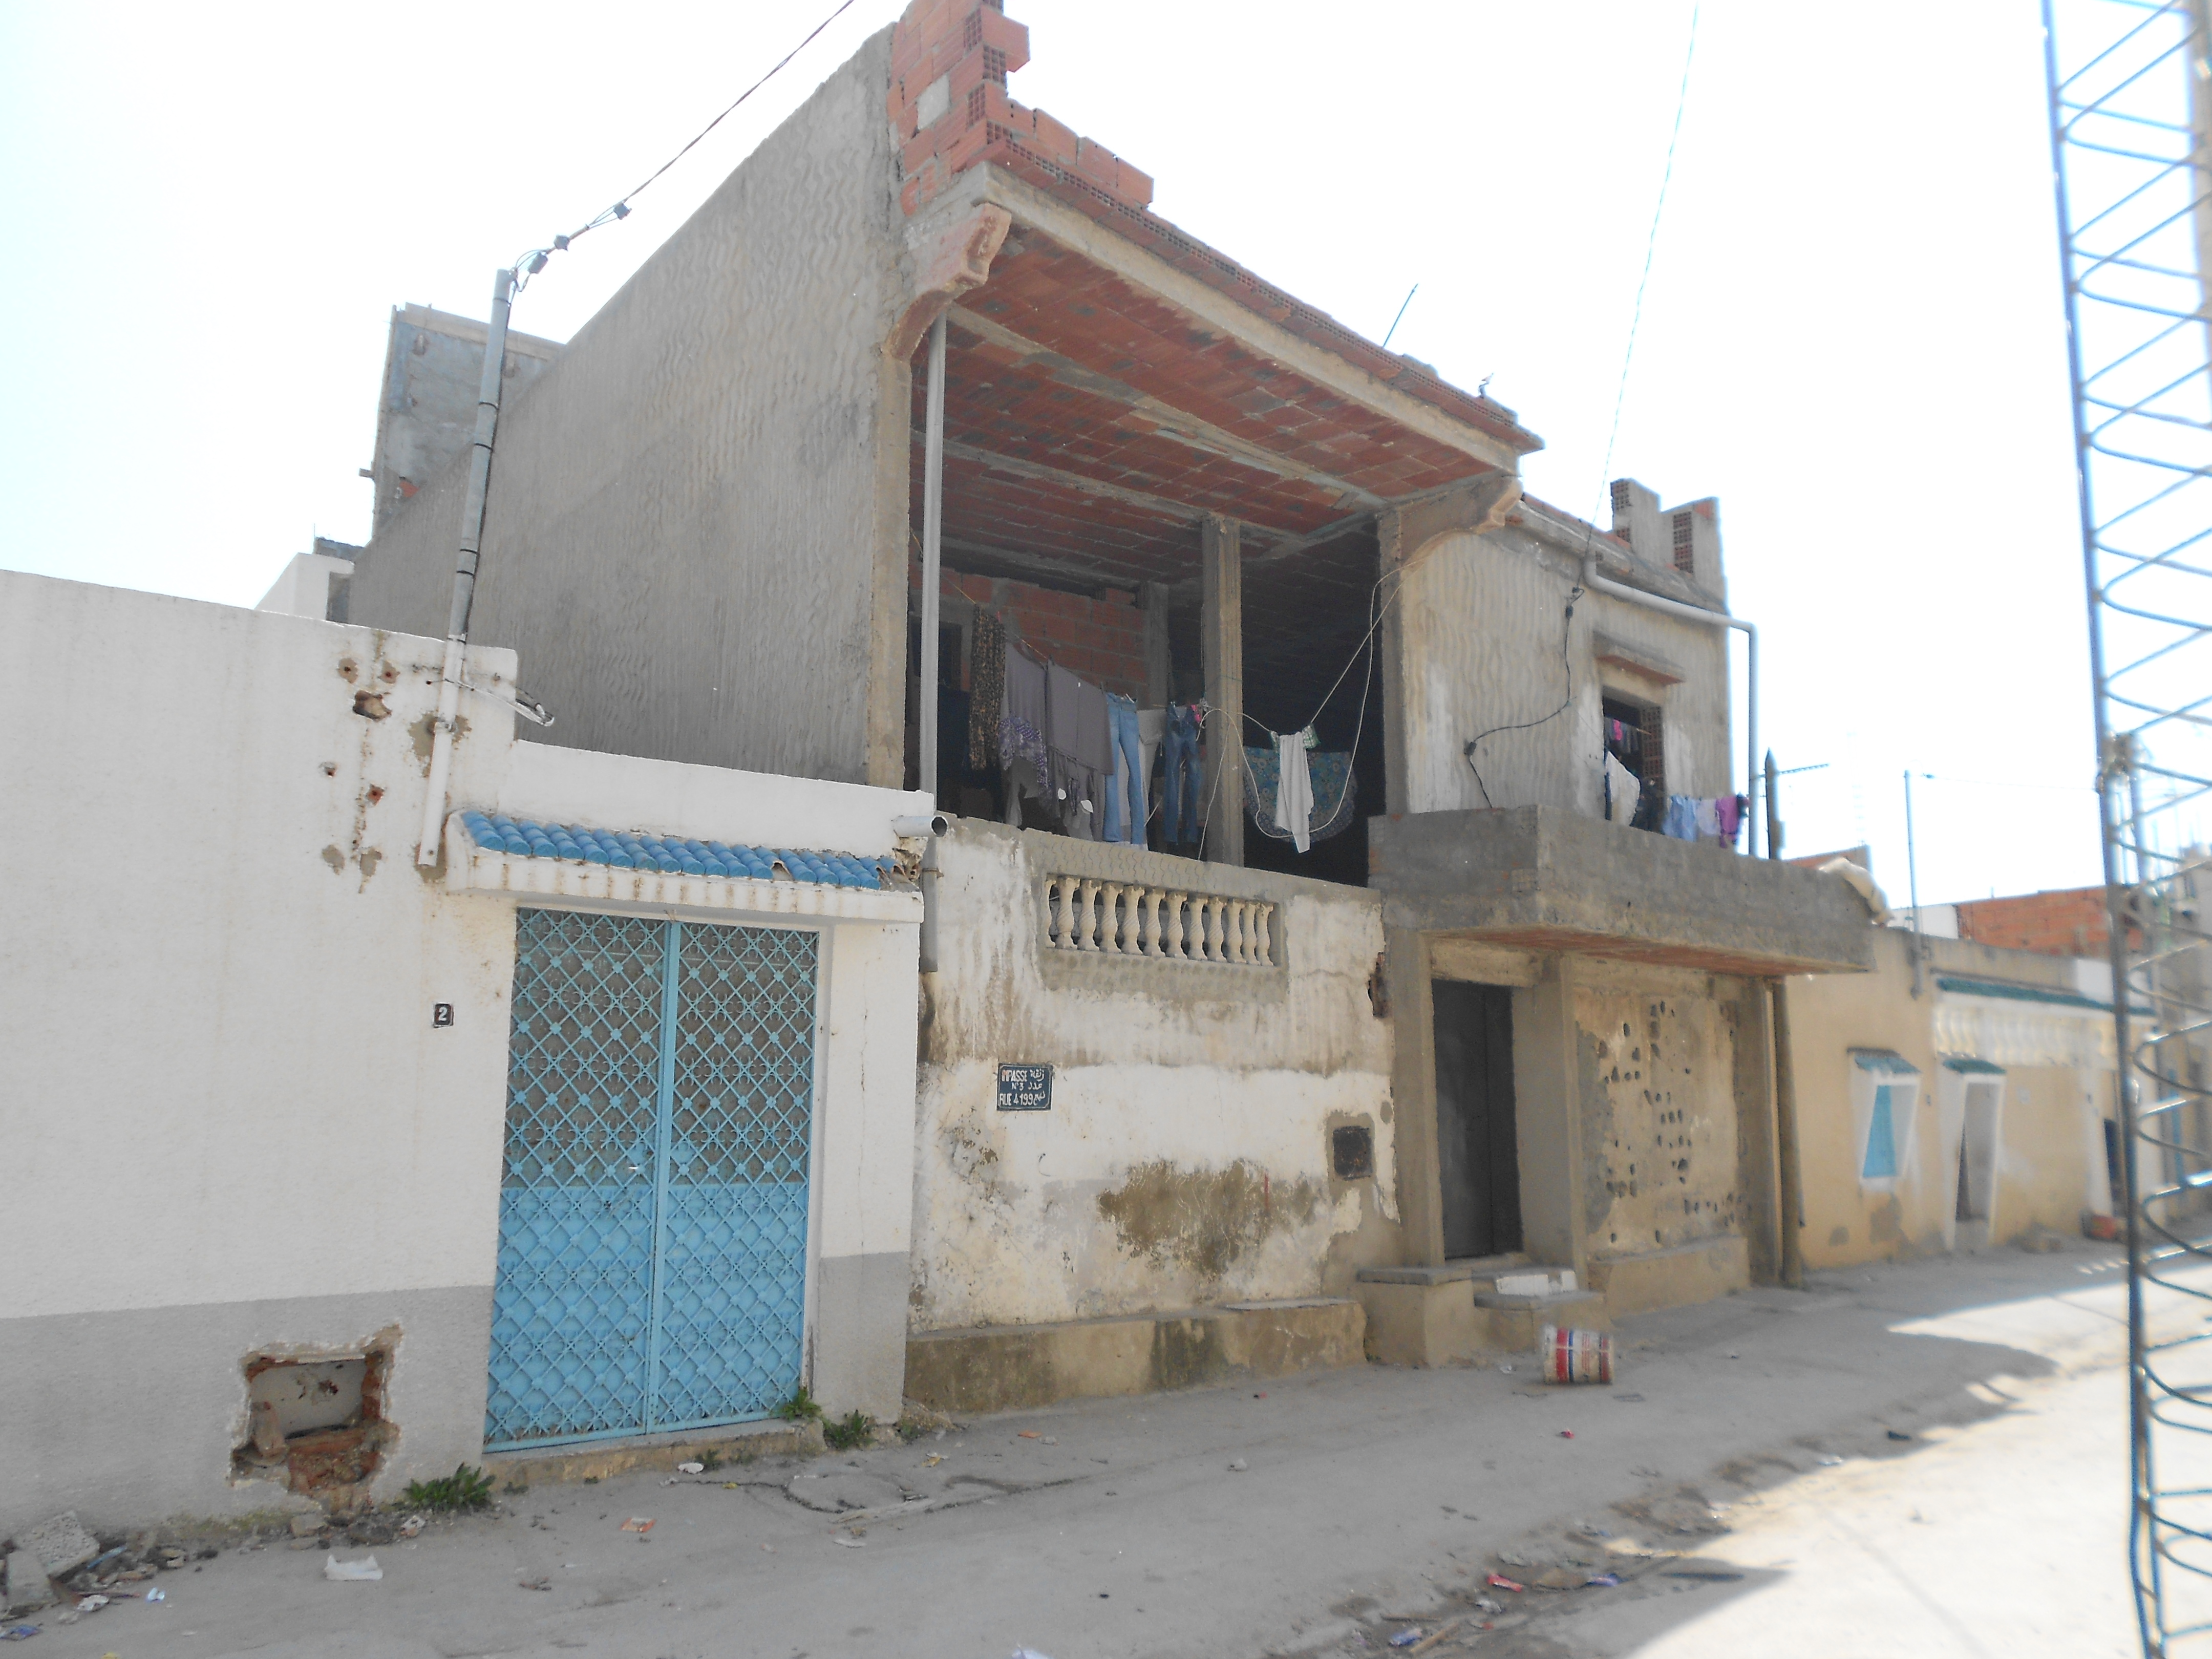 Incremental Self Construction In Tunisiau0027s Quartiers Populaires